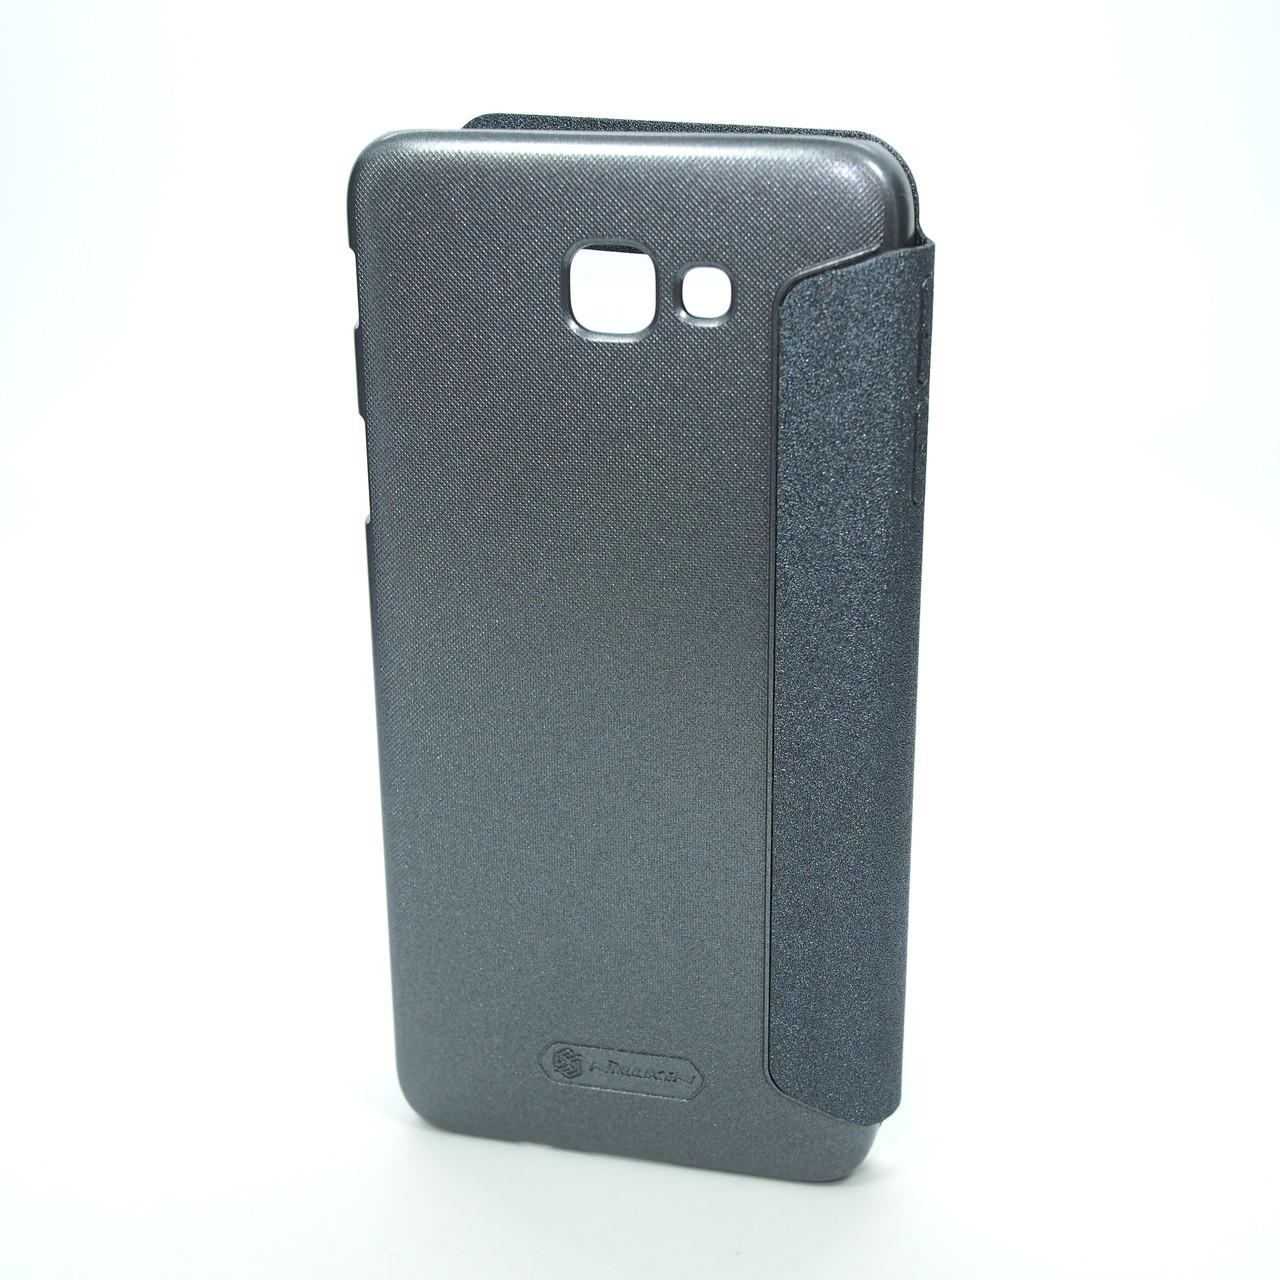 Чехлы для Galaxy J Prime Series Nillkin Sparkle Samsung J5 G570 black (J530) 2017 Для телефона